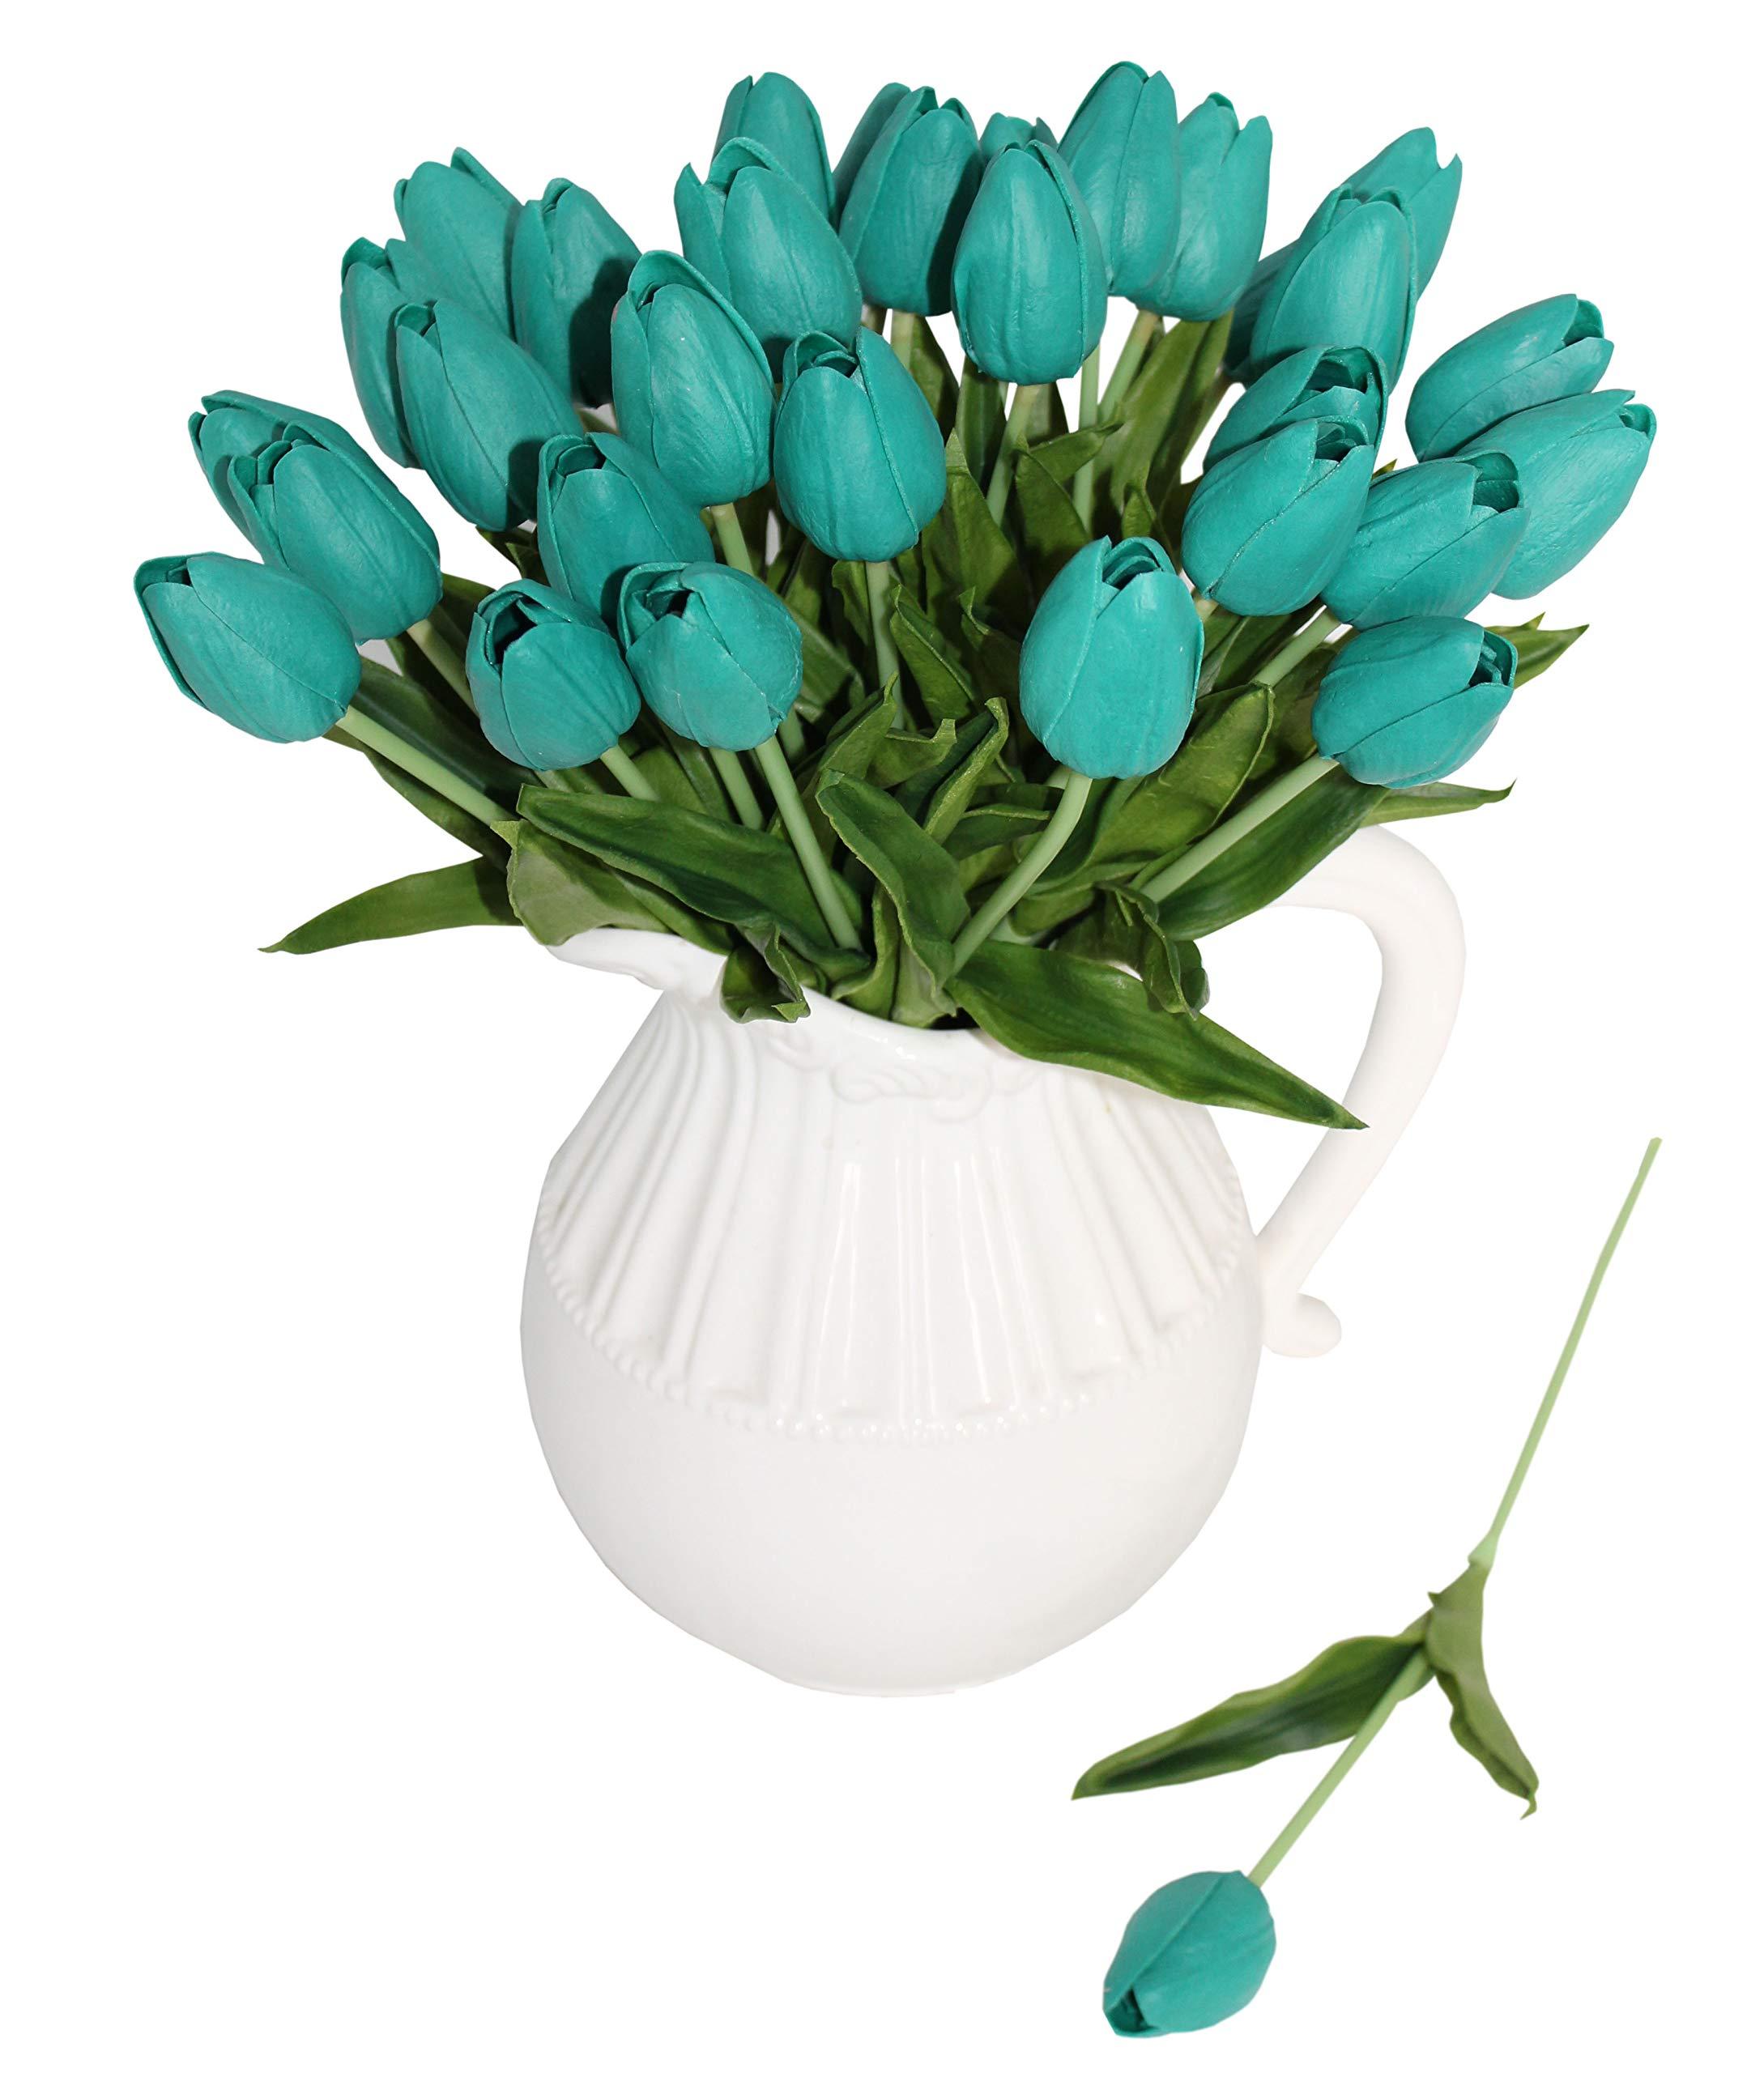 silk flower arrangements aliersa 10-heads home decoration mini tulip real touch tulip artificial flowers bouquets (dark teal)